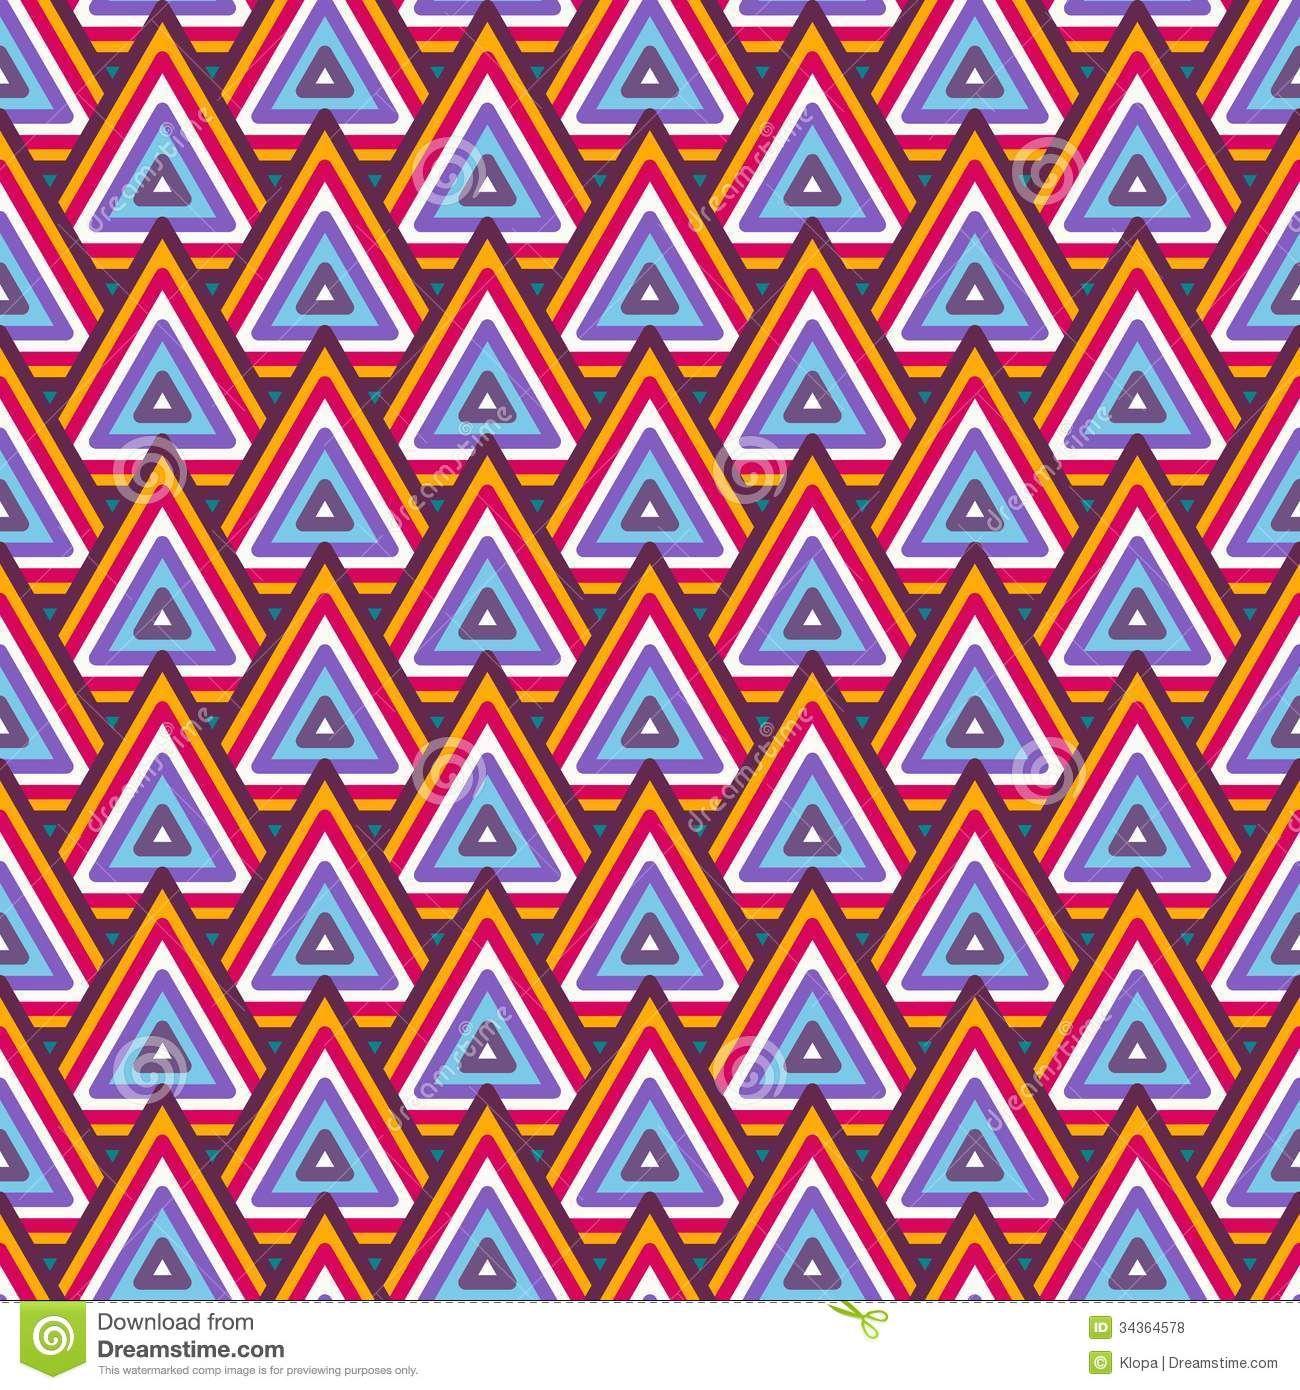 Mayan Patterns Google Search Designs And Patterns